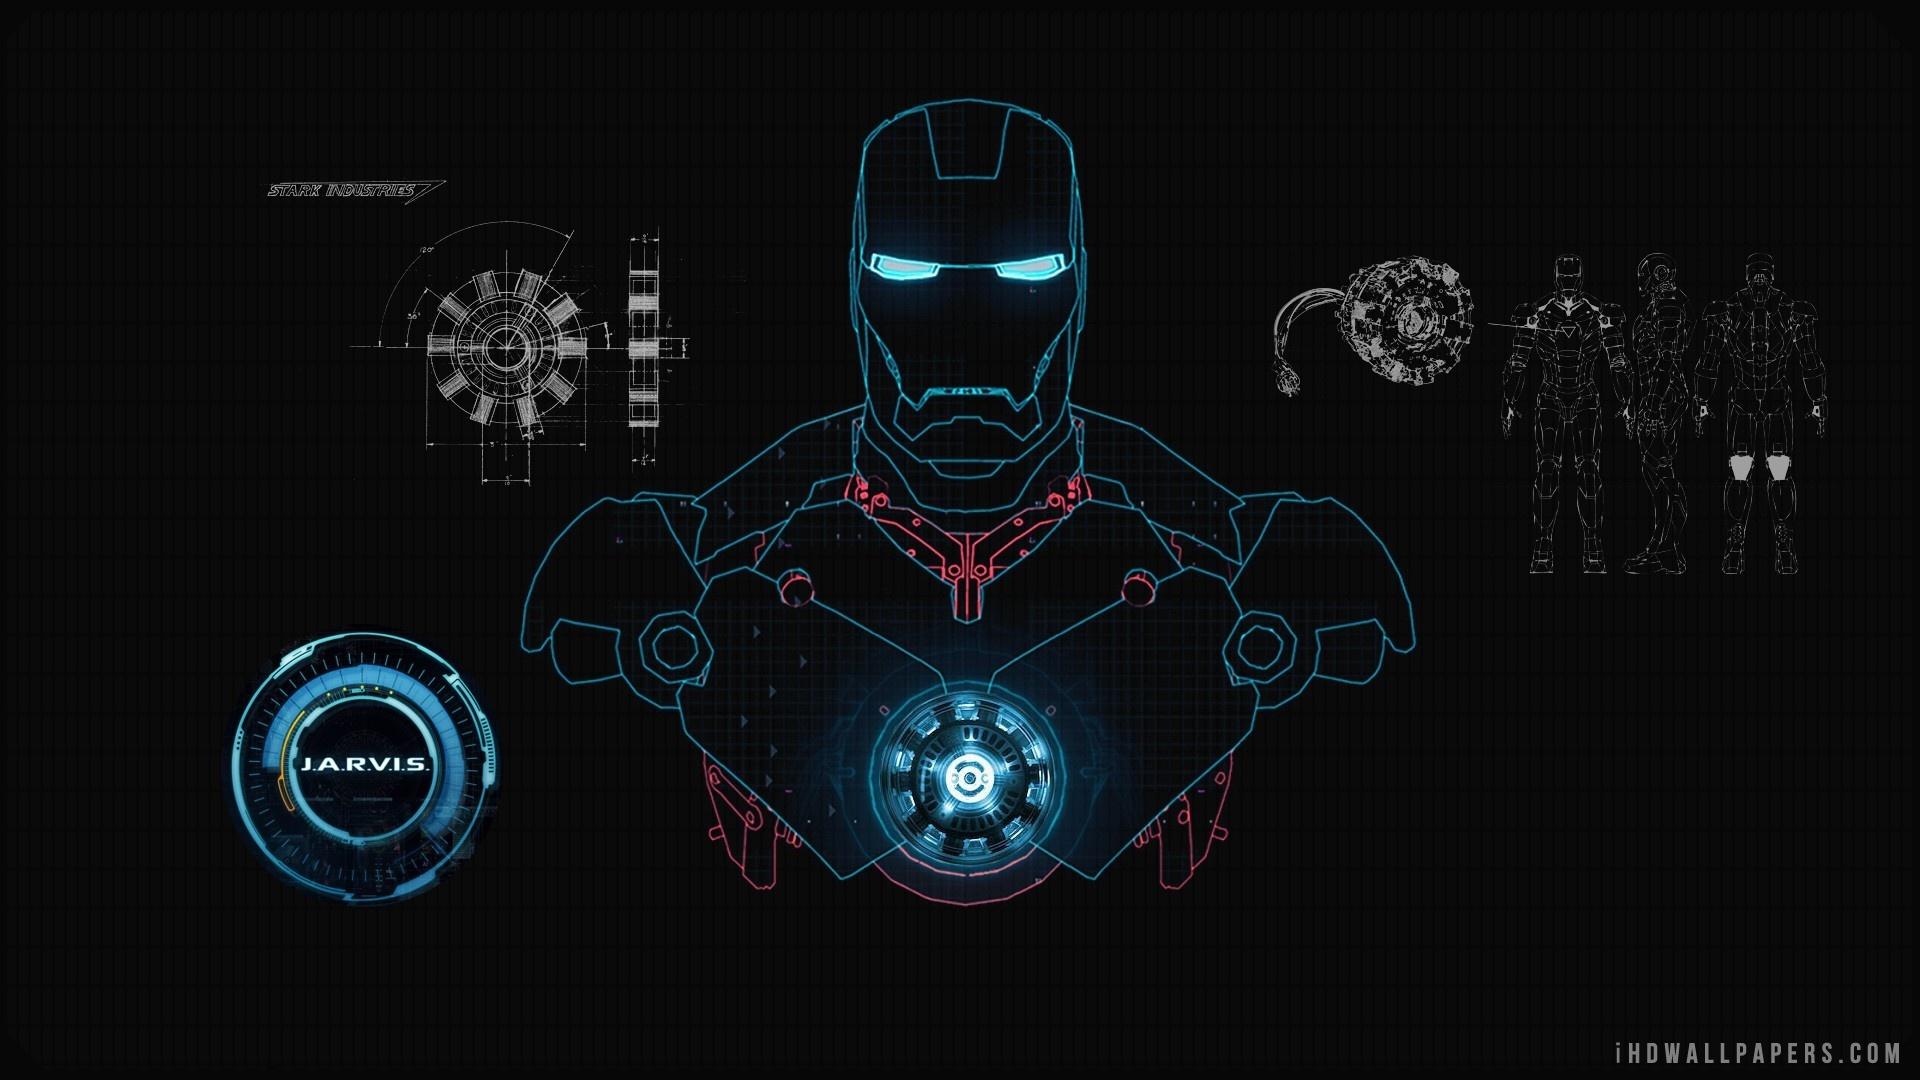 Iron Man JARVIS HD Wallpaper   iHD Wallpapers 1920x1080